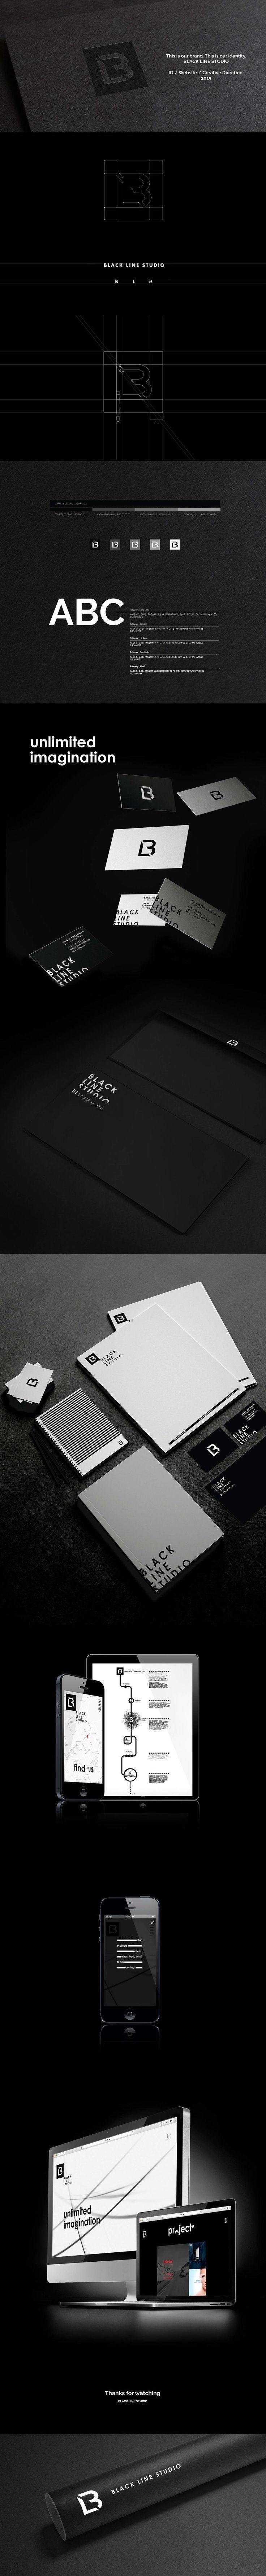 Black Line Studio on Behance